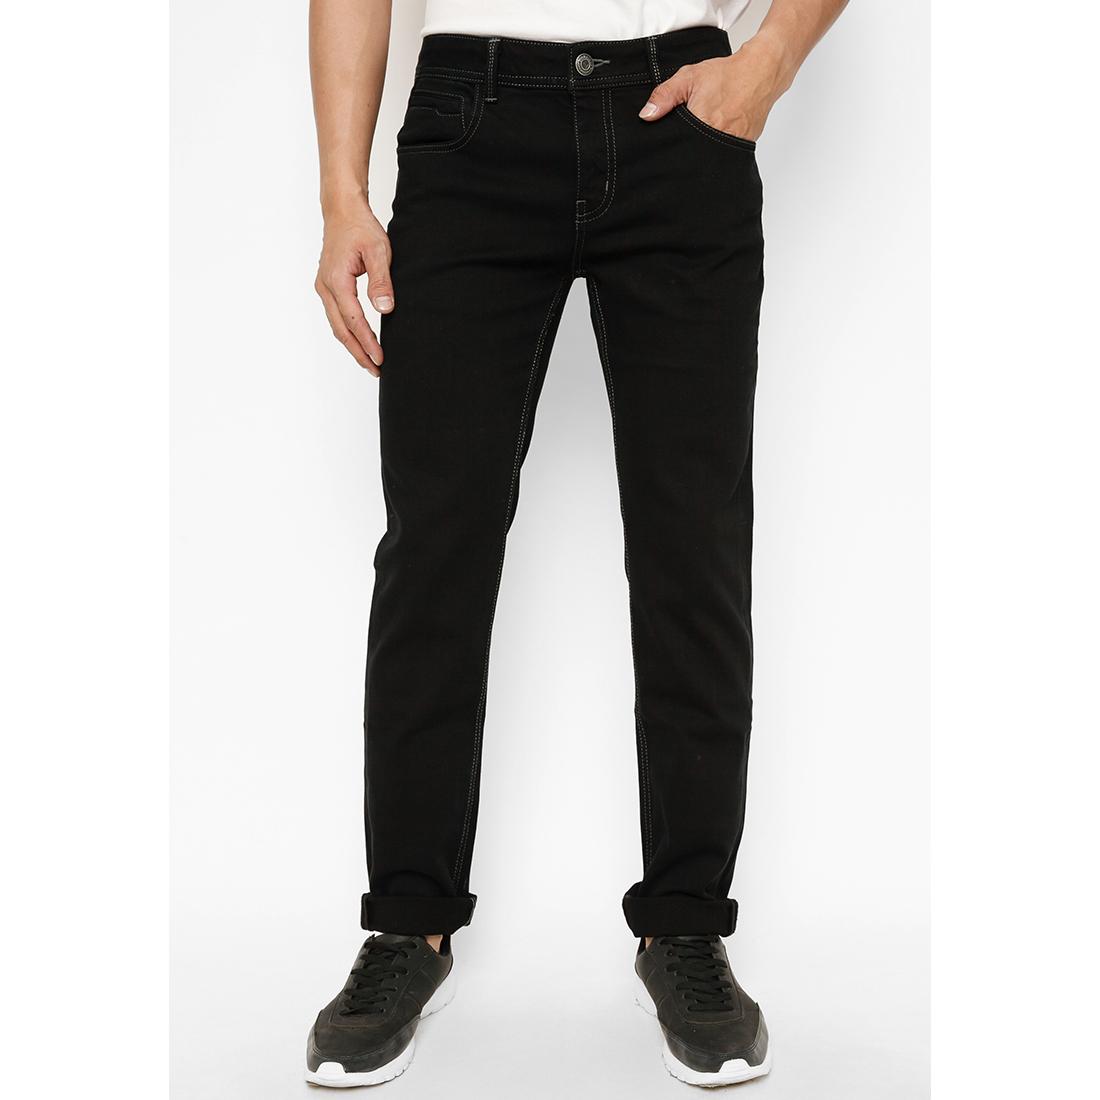 Quần jeans cotton 539 Vĩnh Tiến - JEAN 01 (đen)